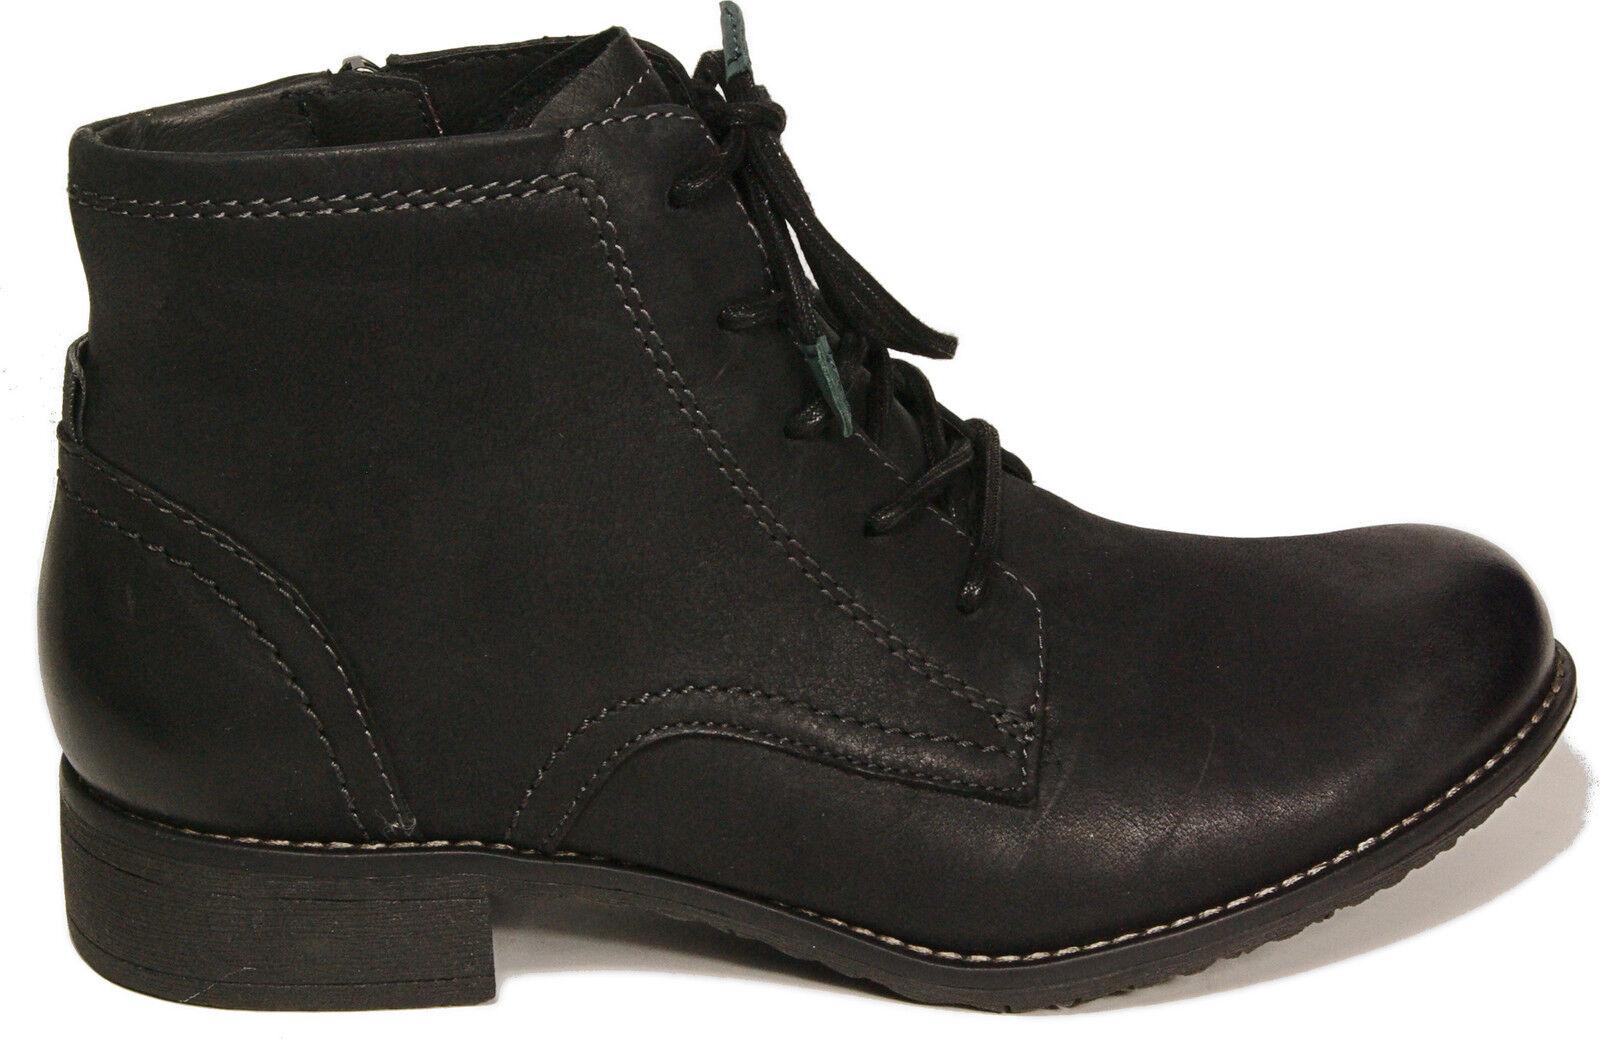 Tamaris zapatos ata botín Echt Leder negro cremallera nuevo